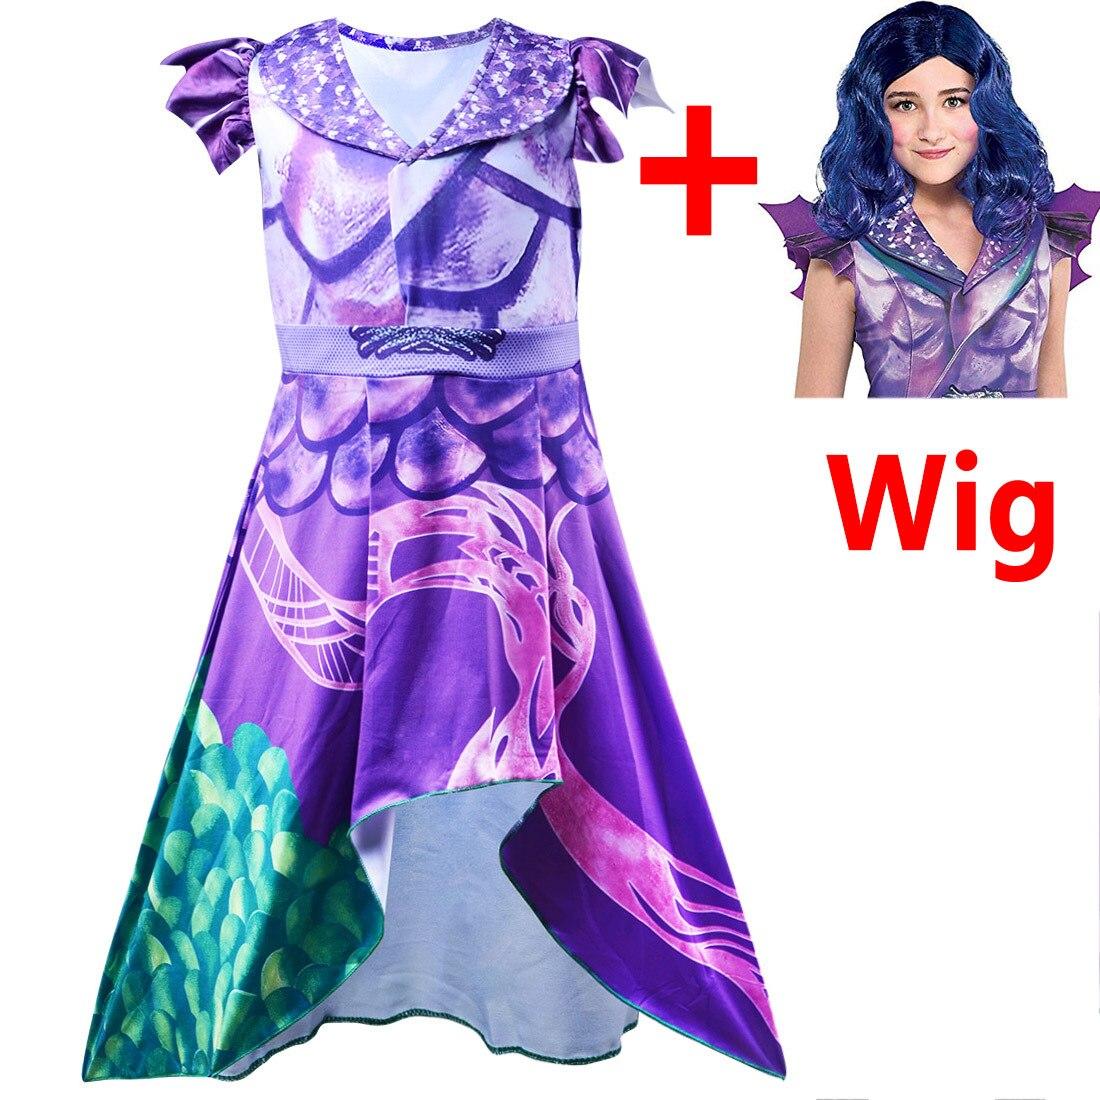 Girls Cosplay Costume Descendants 3 Purple Dress Cosplay Costume Kids 3D Printed Halloween Girls Carnival Party Girls Costumes